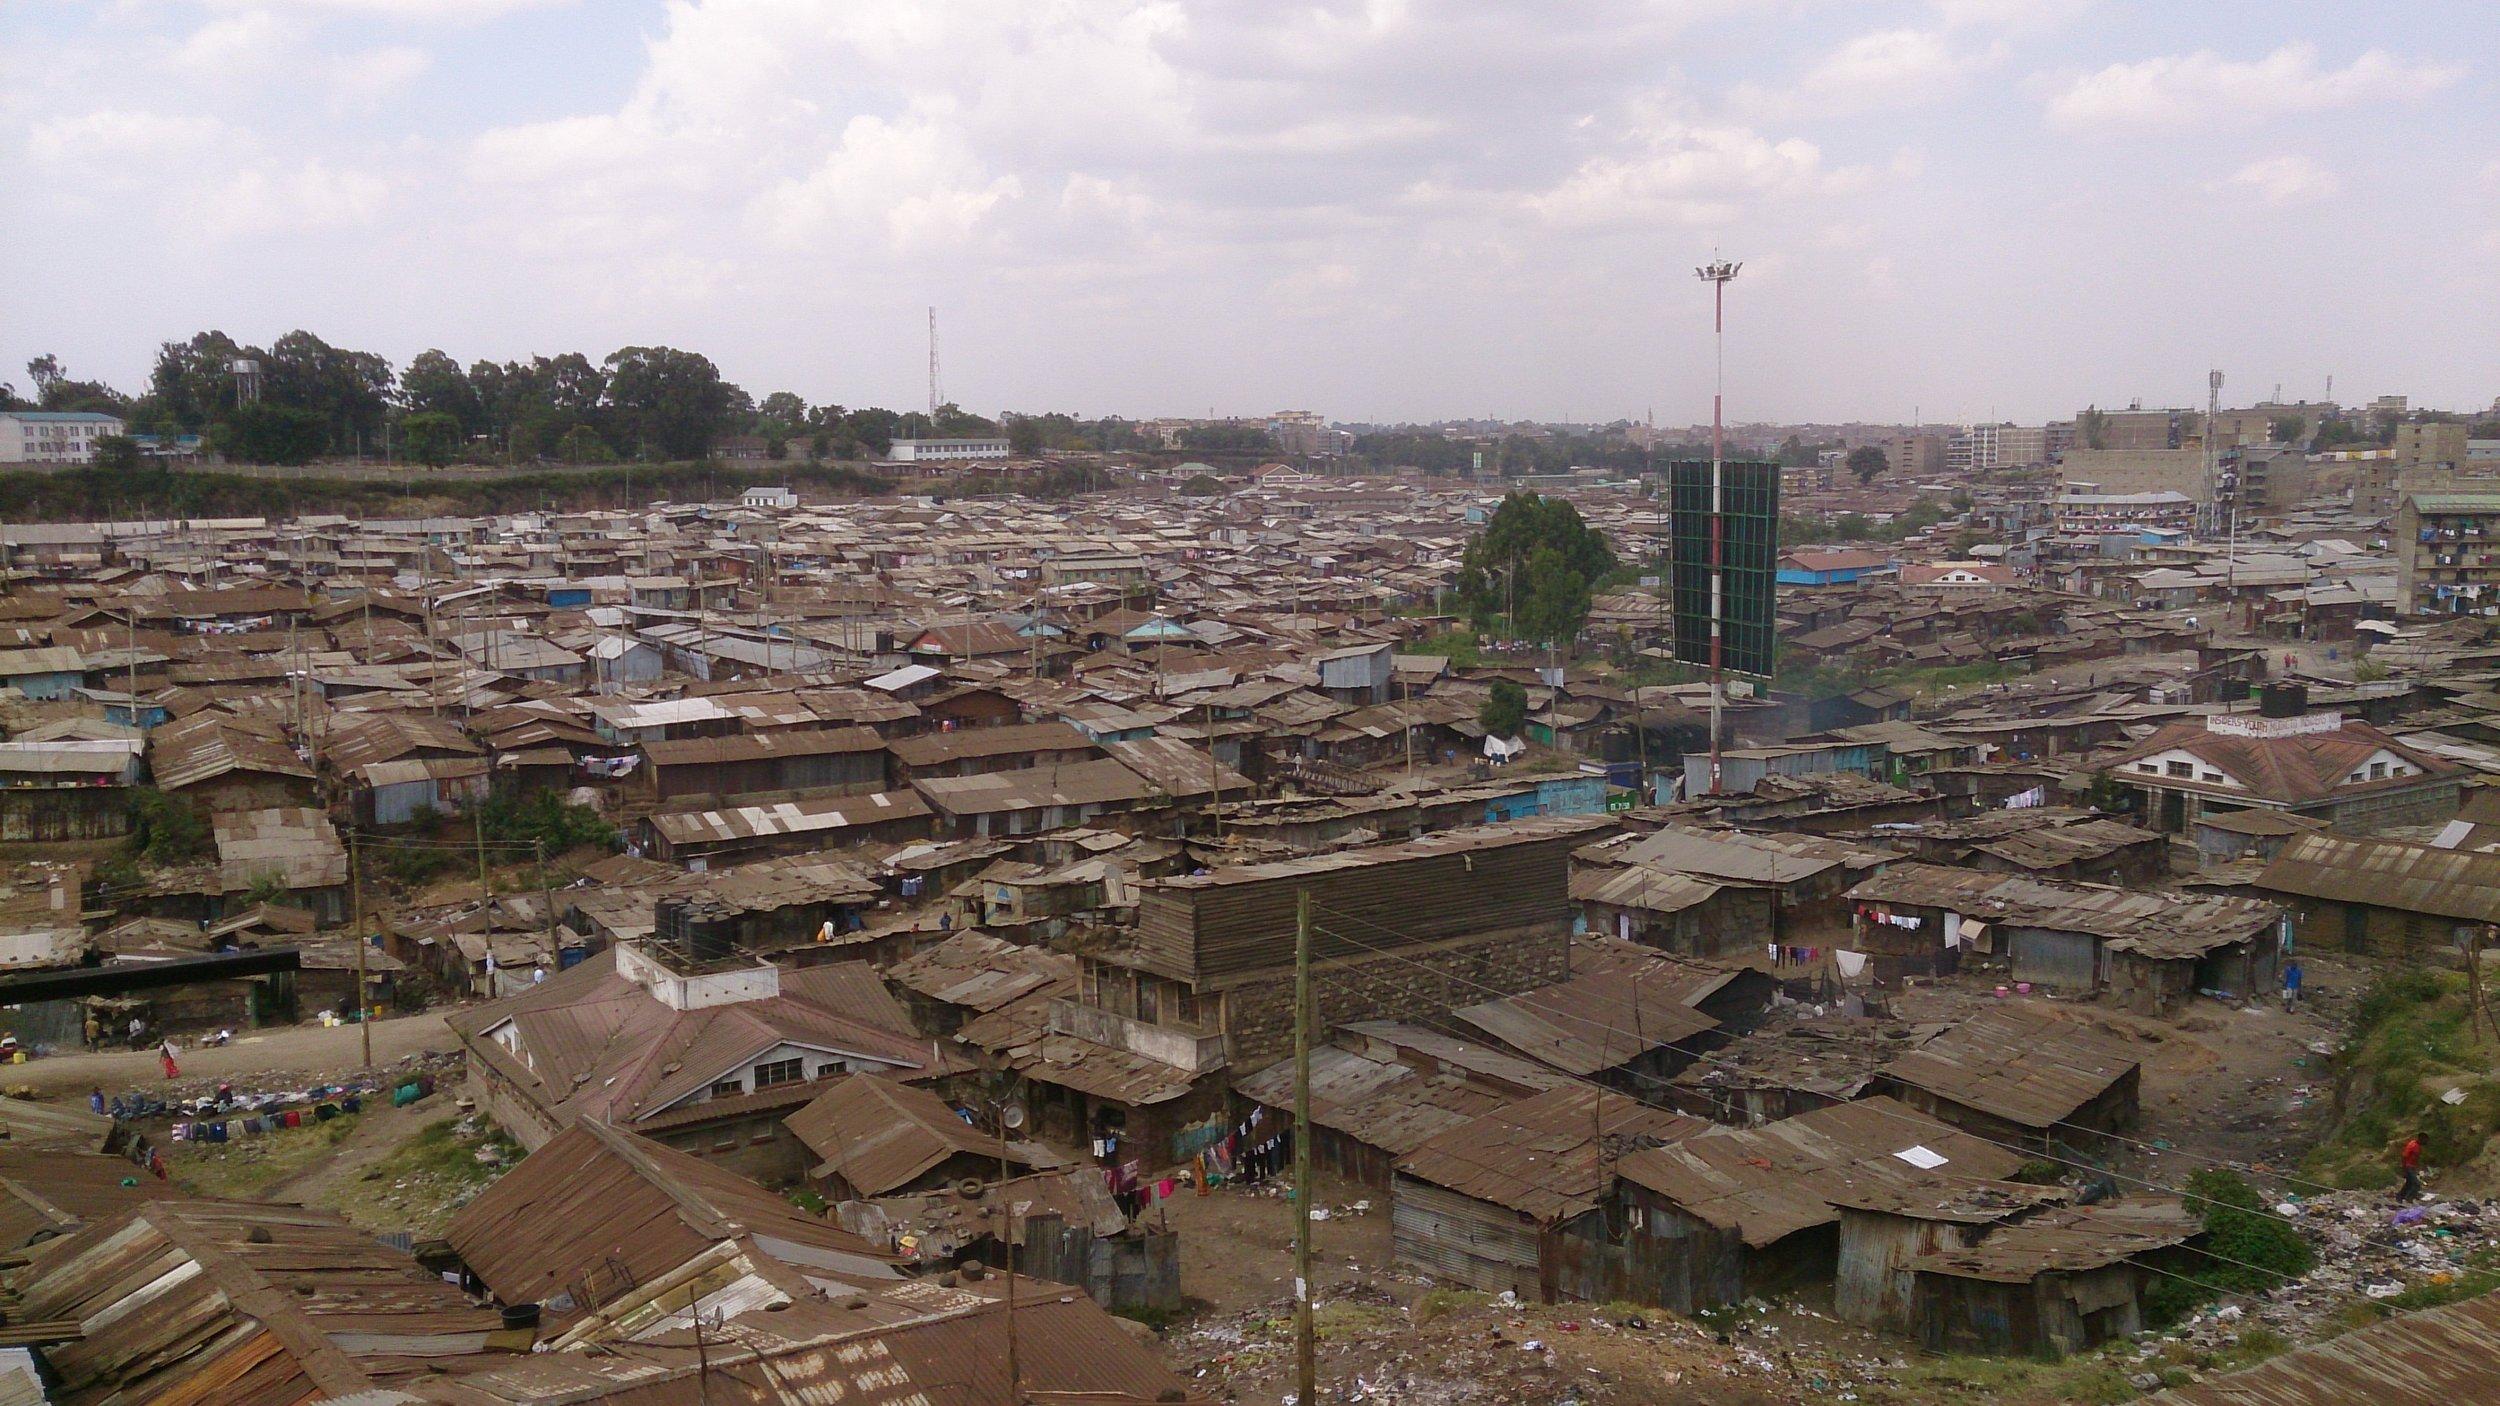 Mathare settlement Aerial view